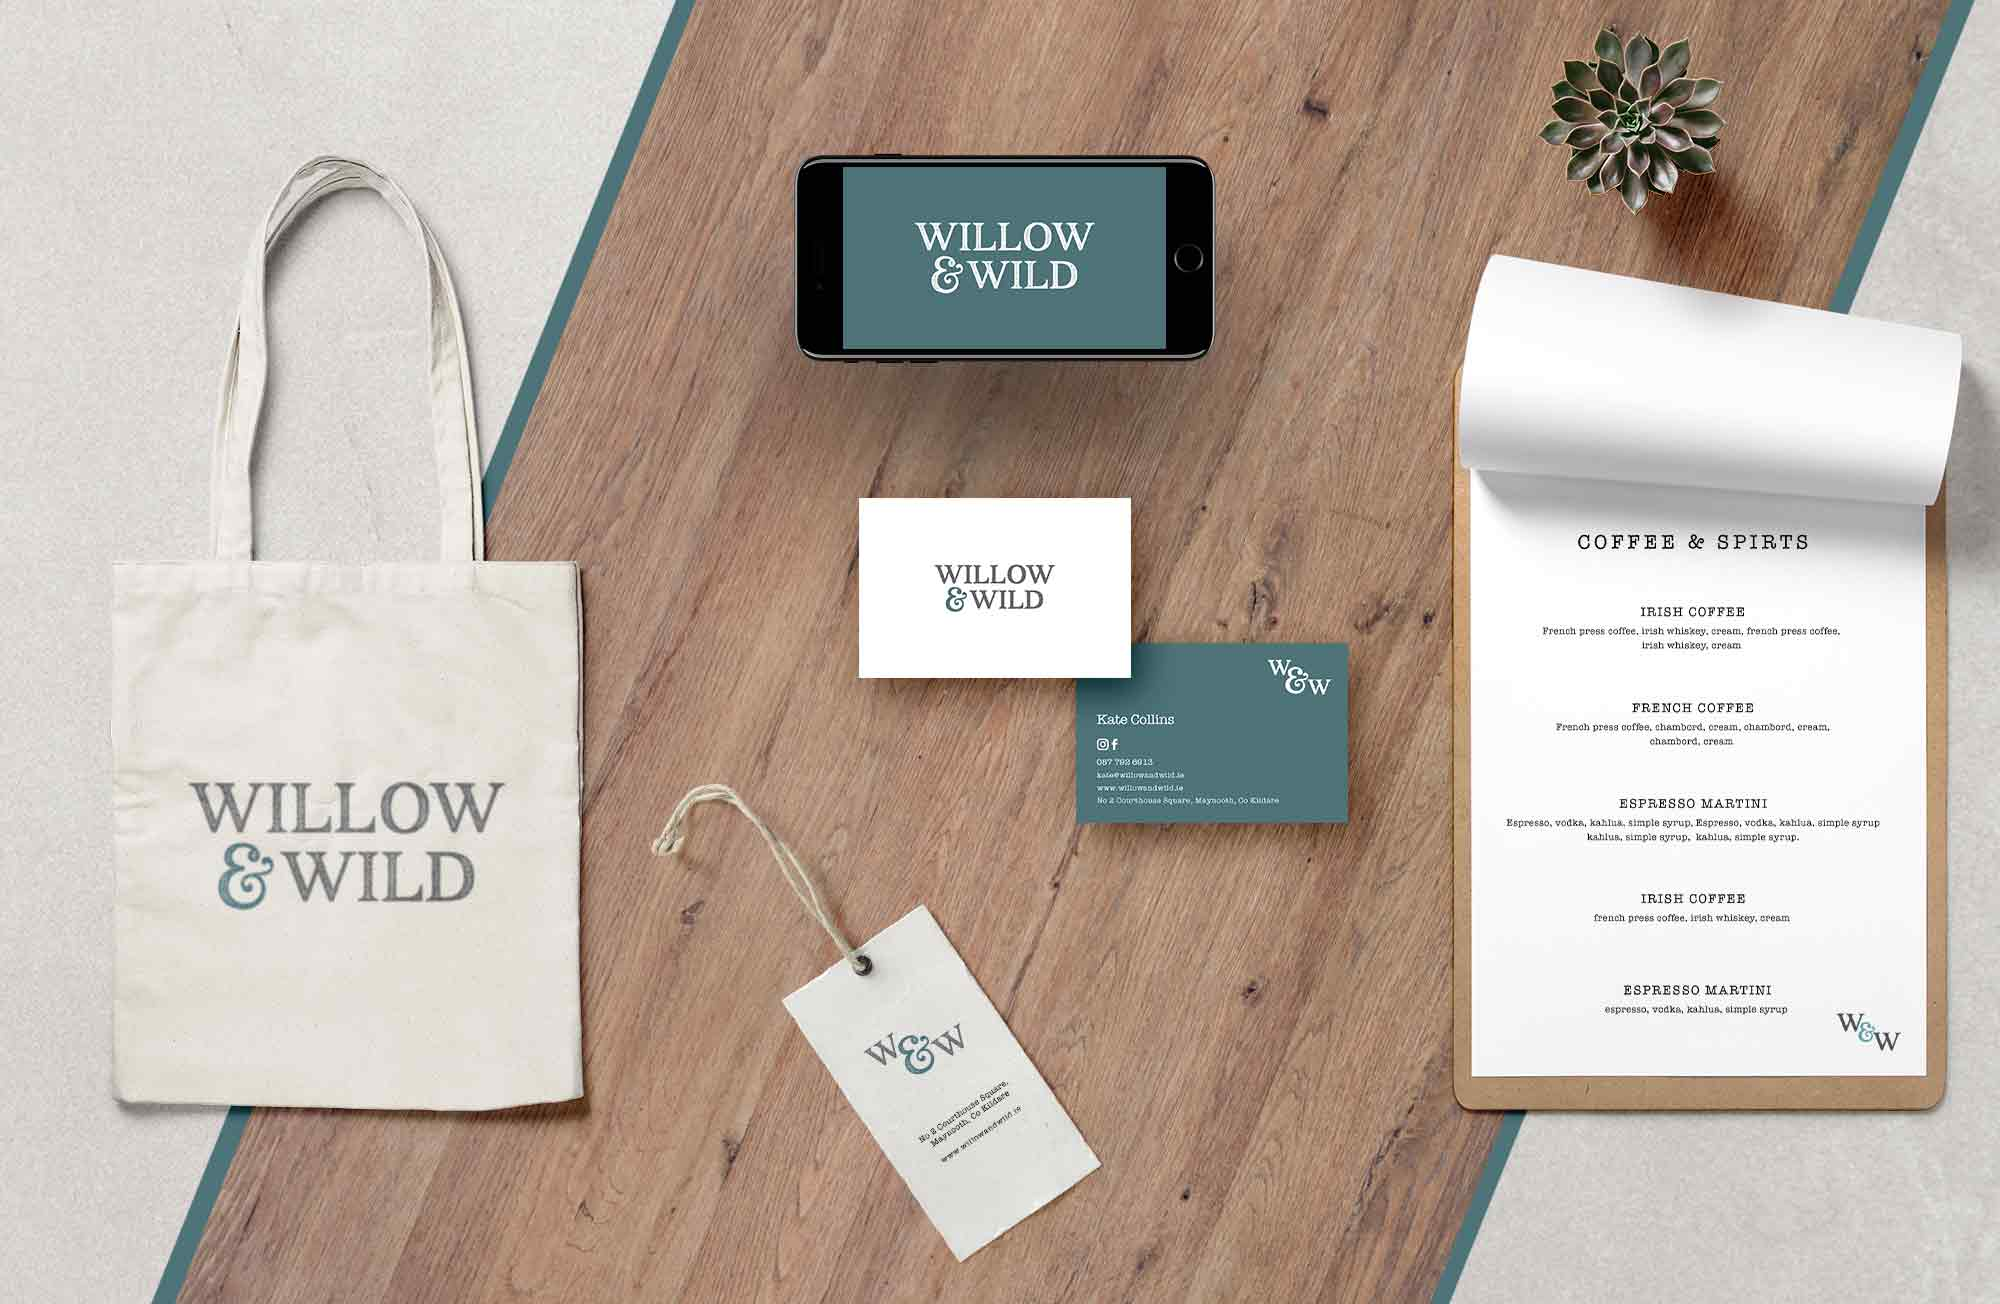 Willow-&-Wild.jpg